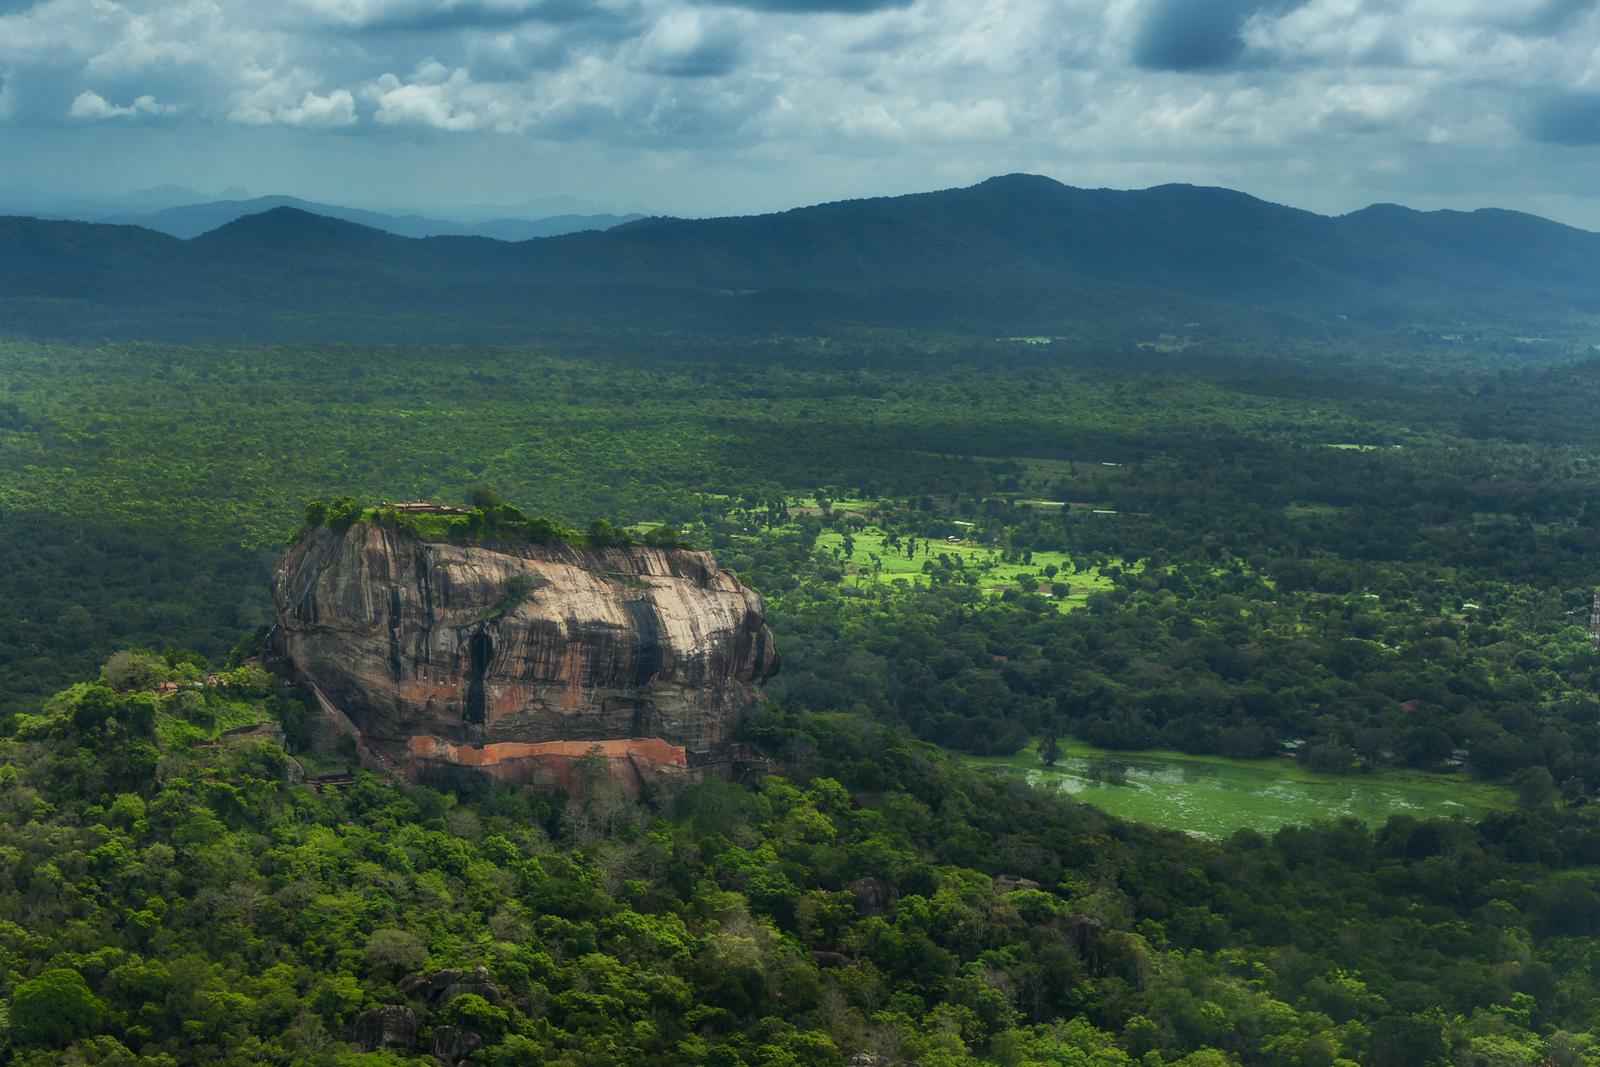 An aerial view of Sigiriya in Sri Lanka